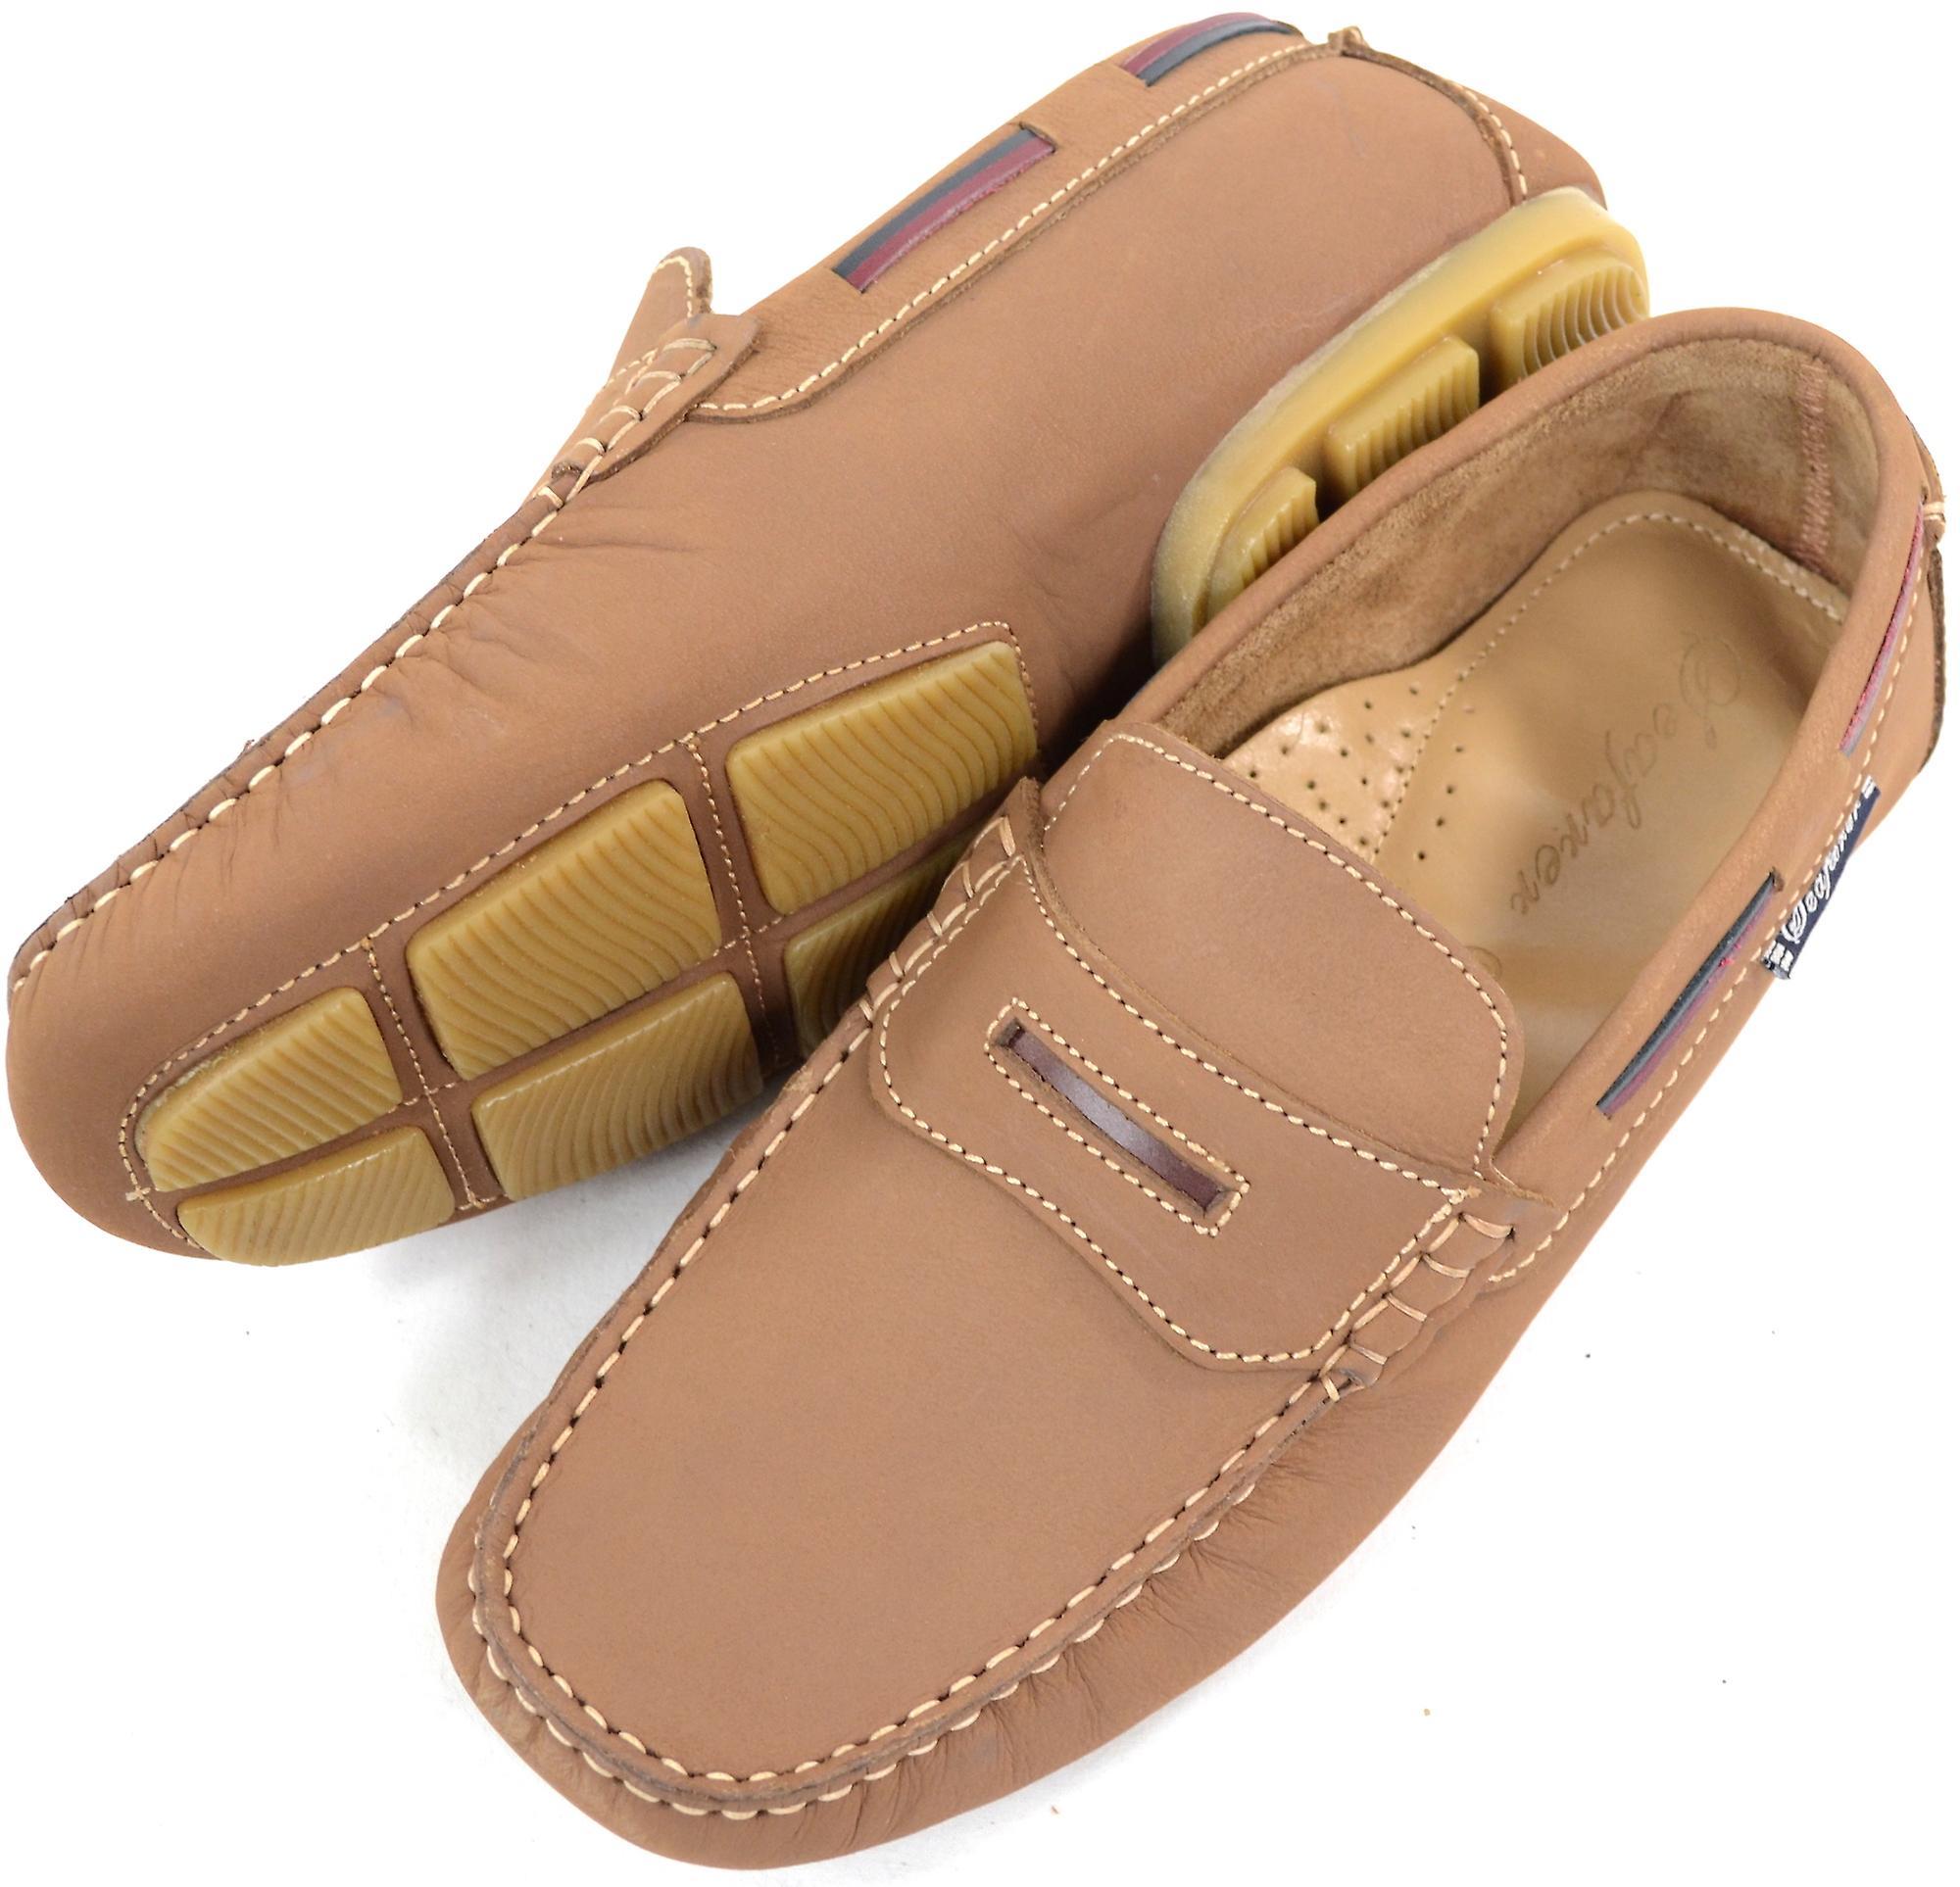 Herren Leder lässig / formellen Slip auf Boot / Deck Slipper / Mokassin Schuhe - Tan - UK 11